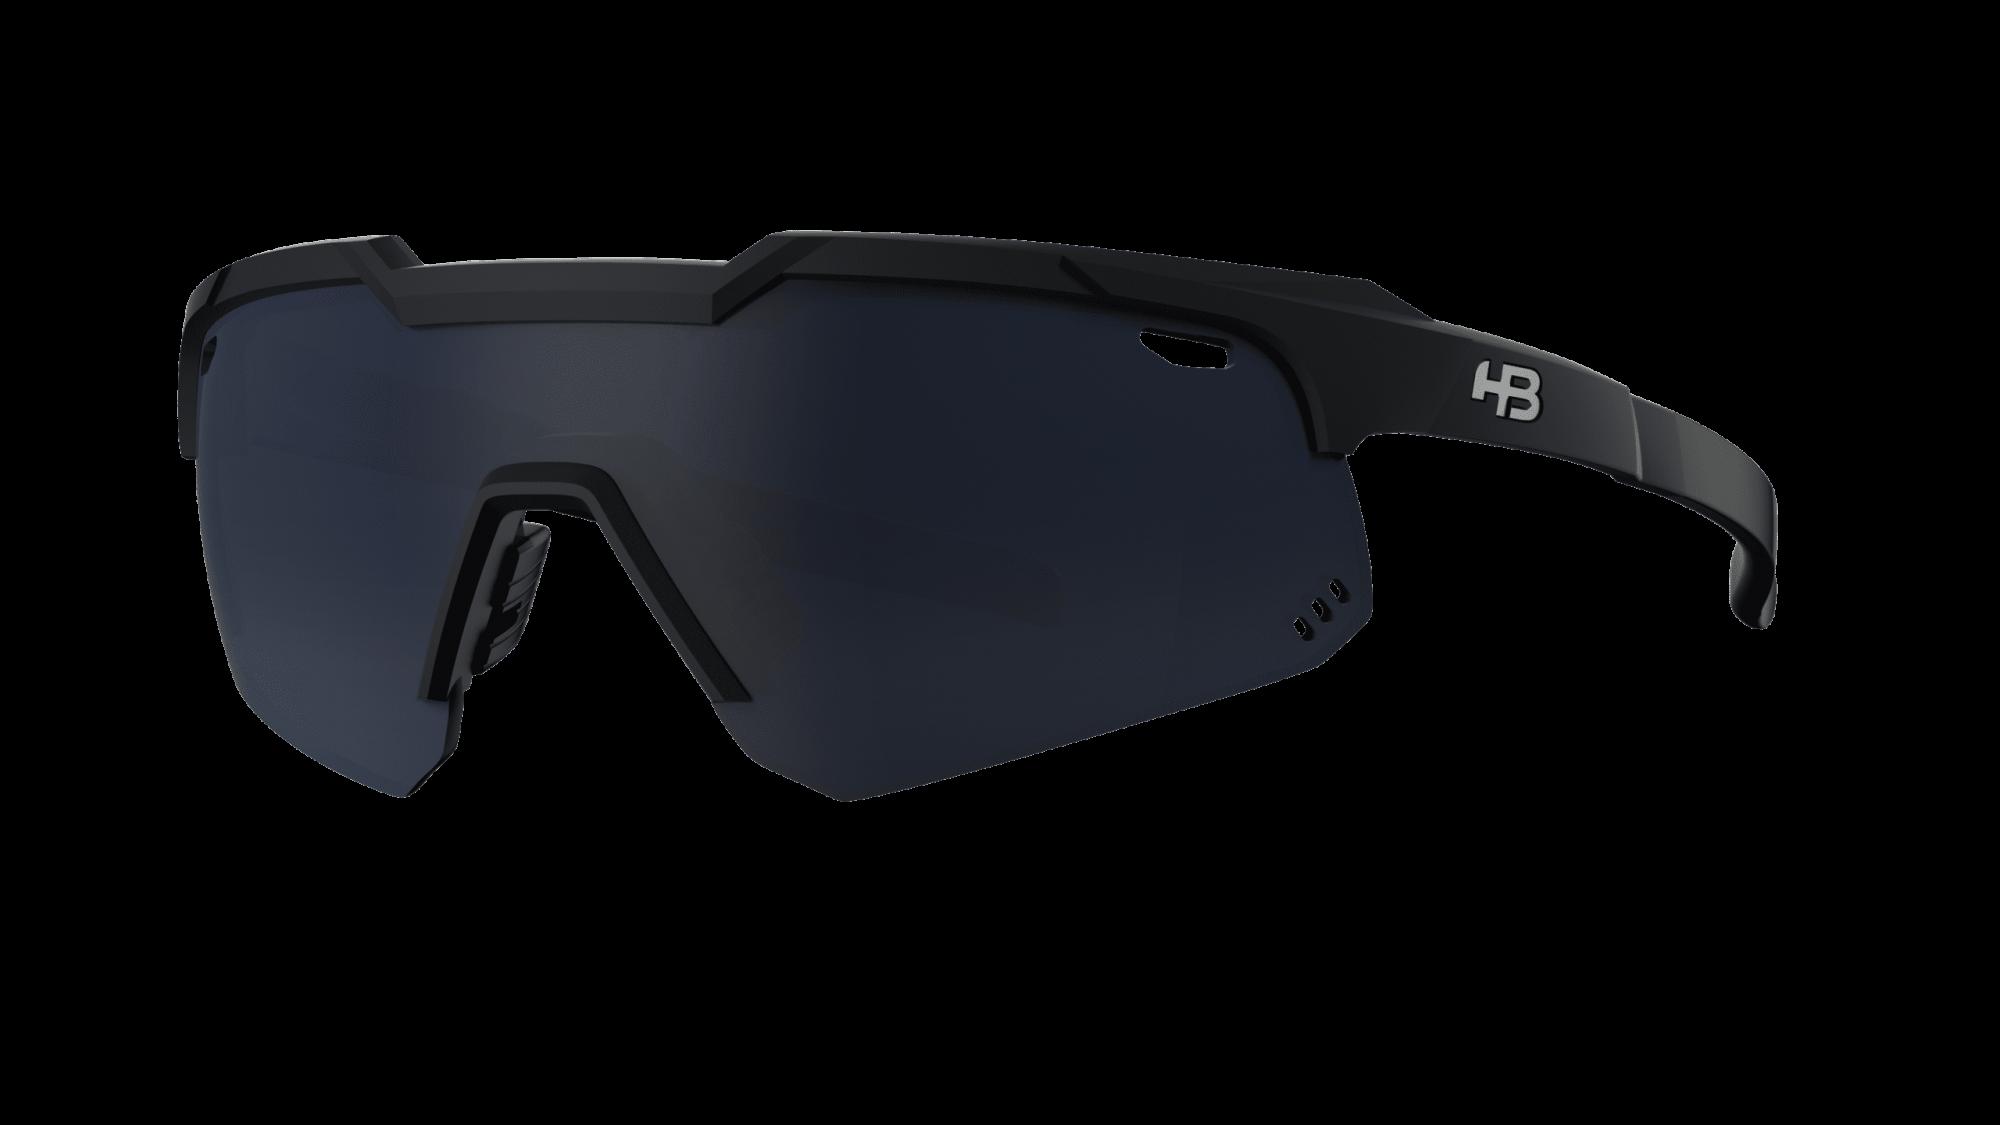 Óculos Shield Evo Mountain HB Matte Black Gray